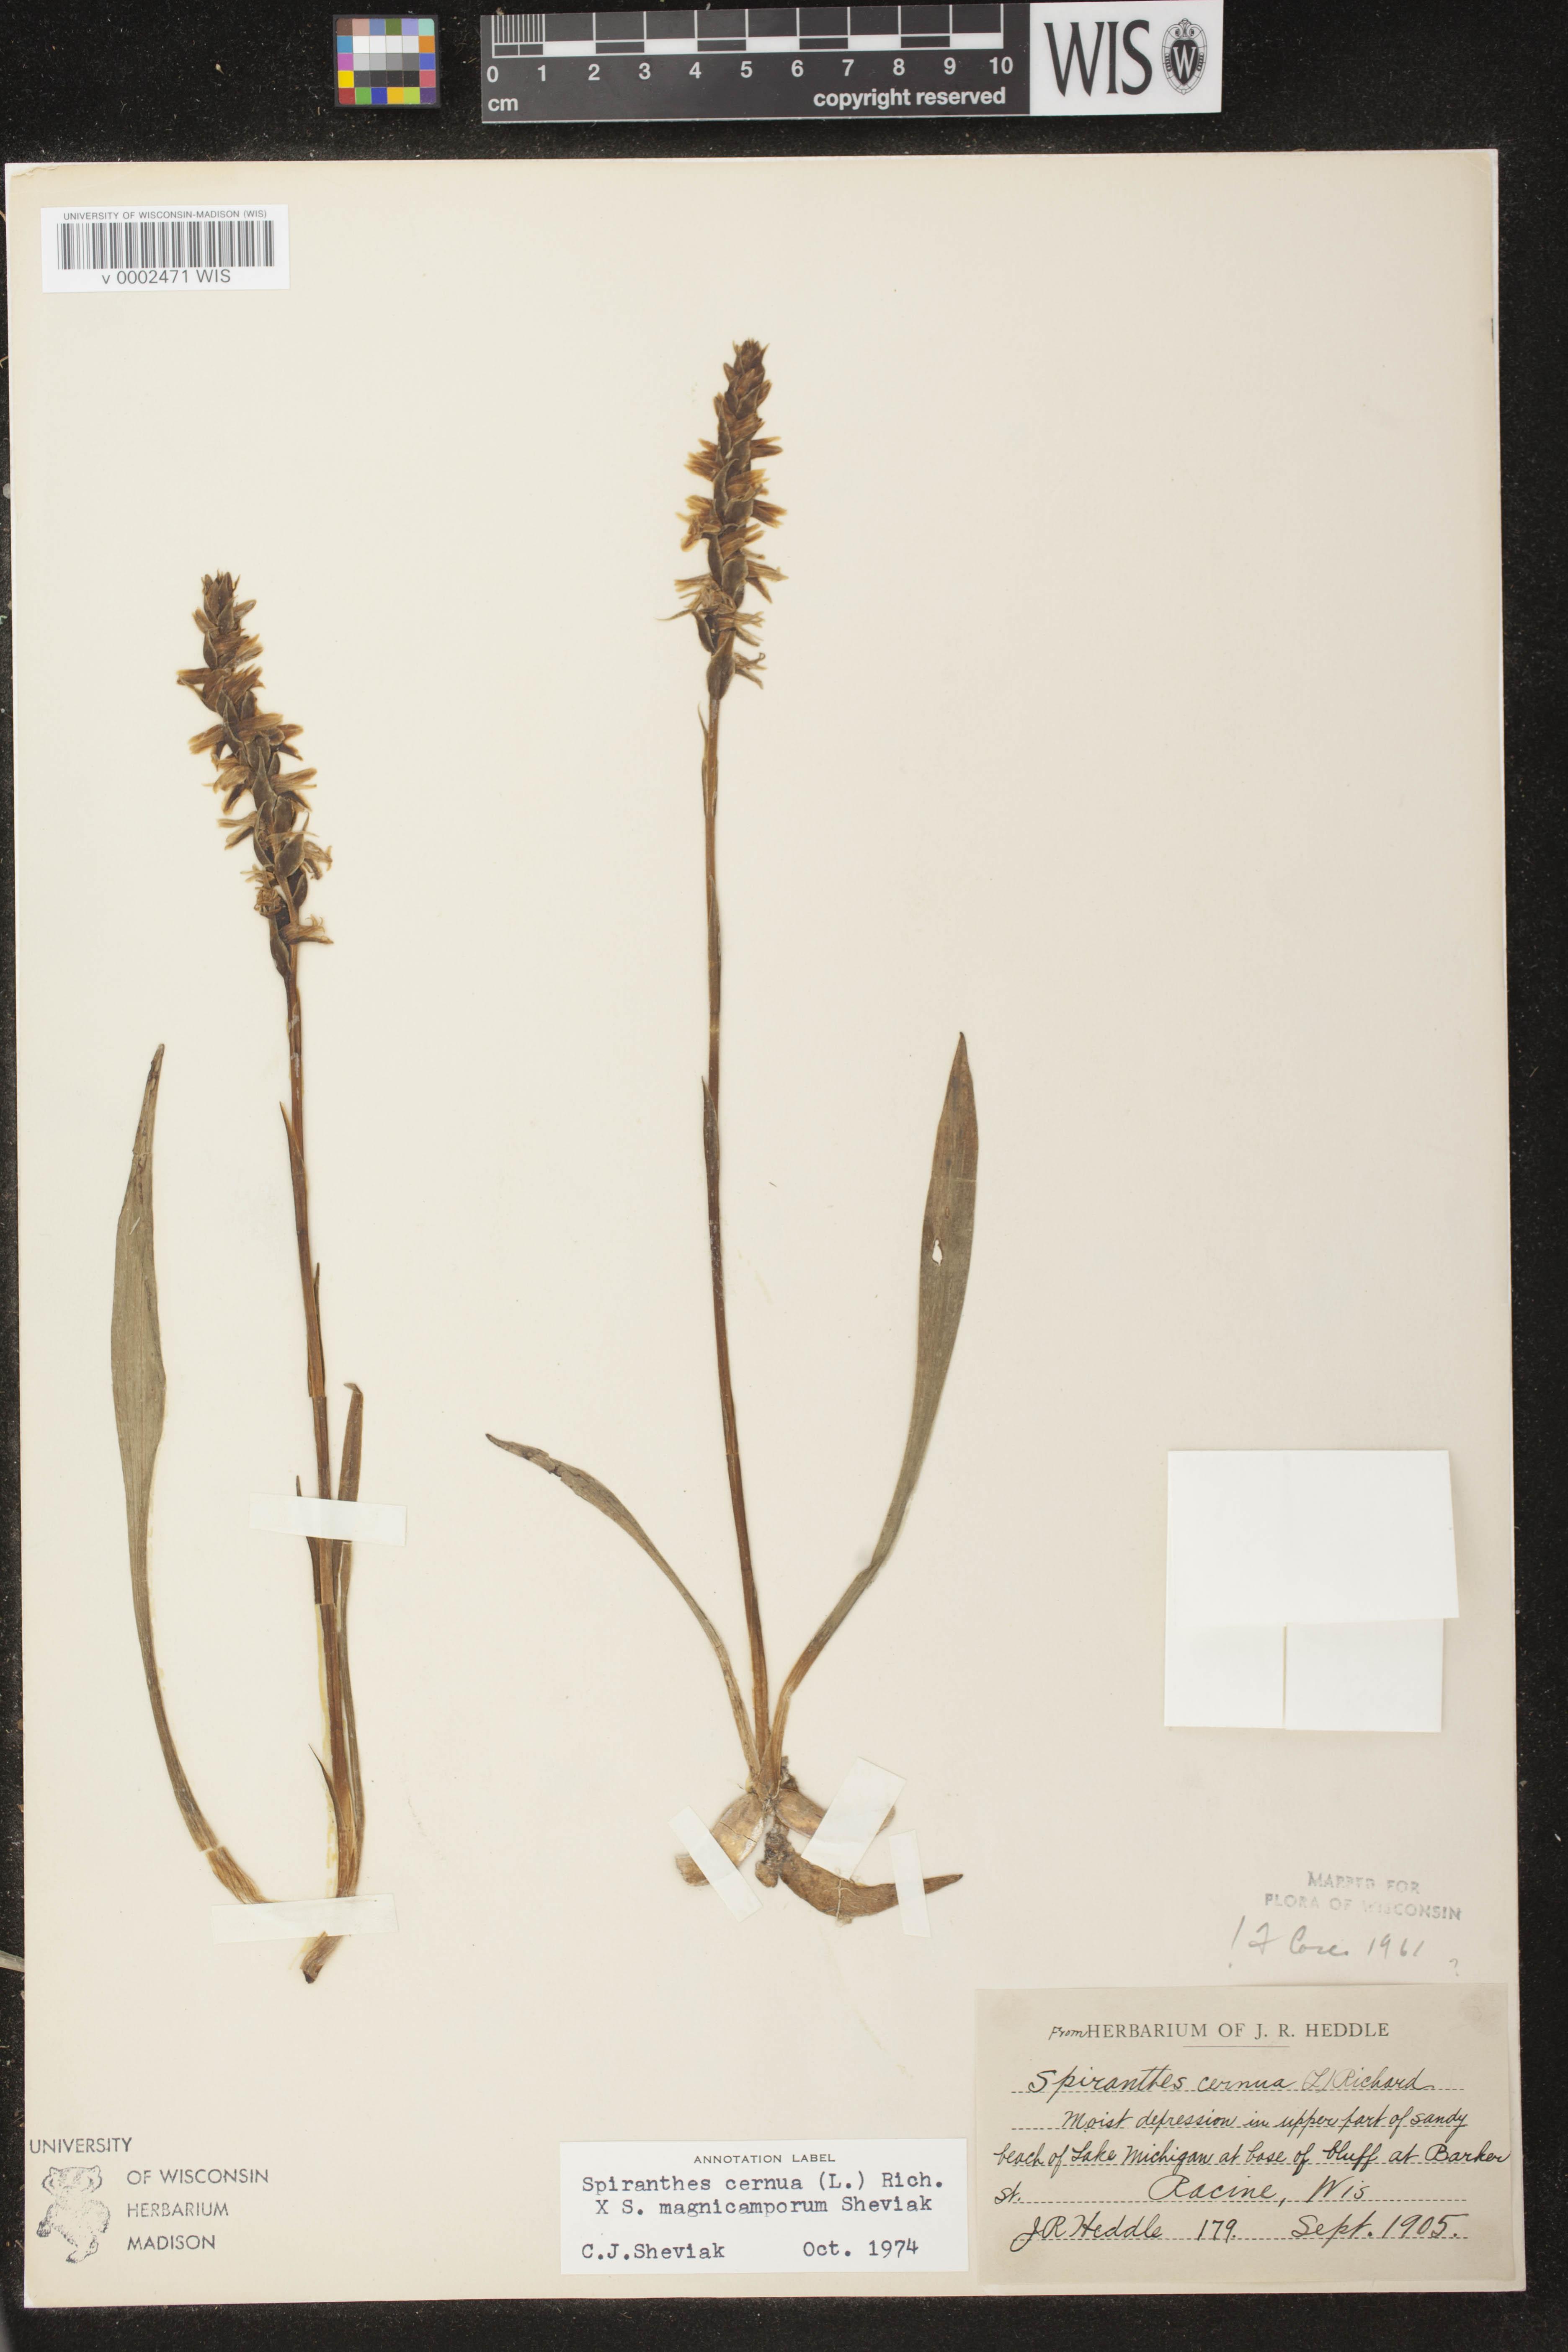 Image of Spiranthes cernua x s. magnicamporum